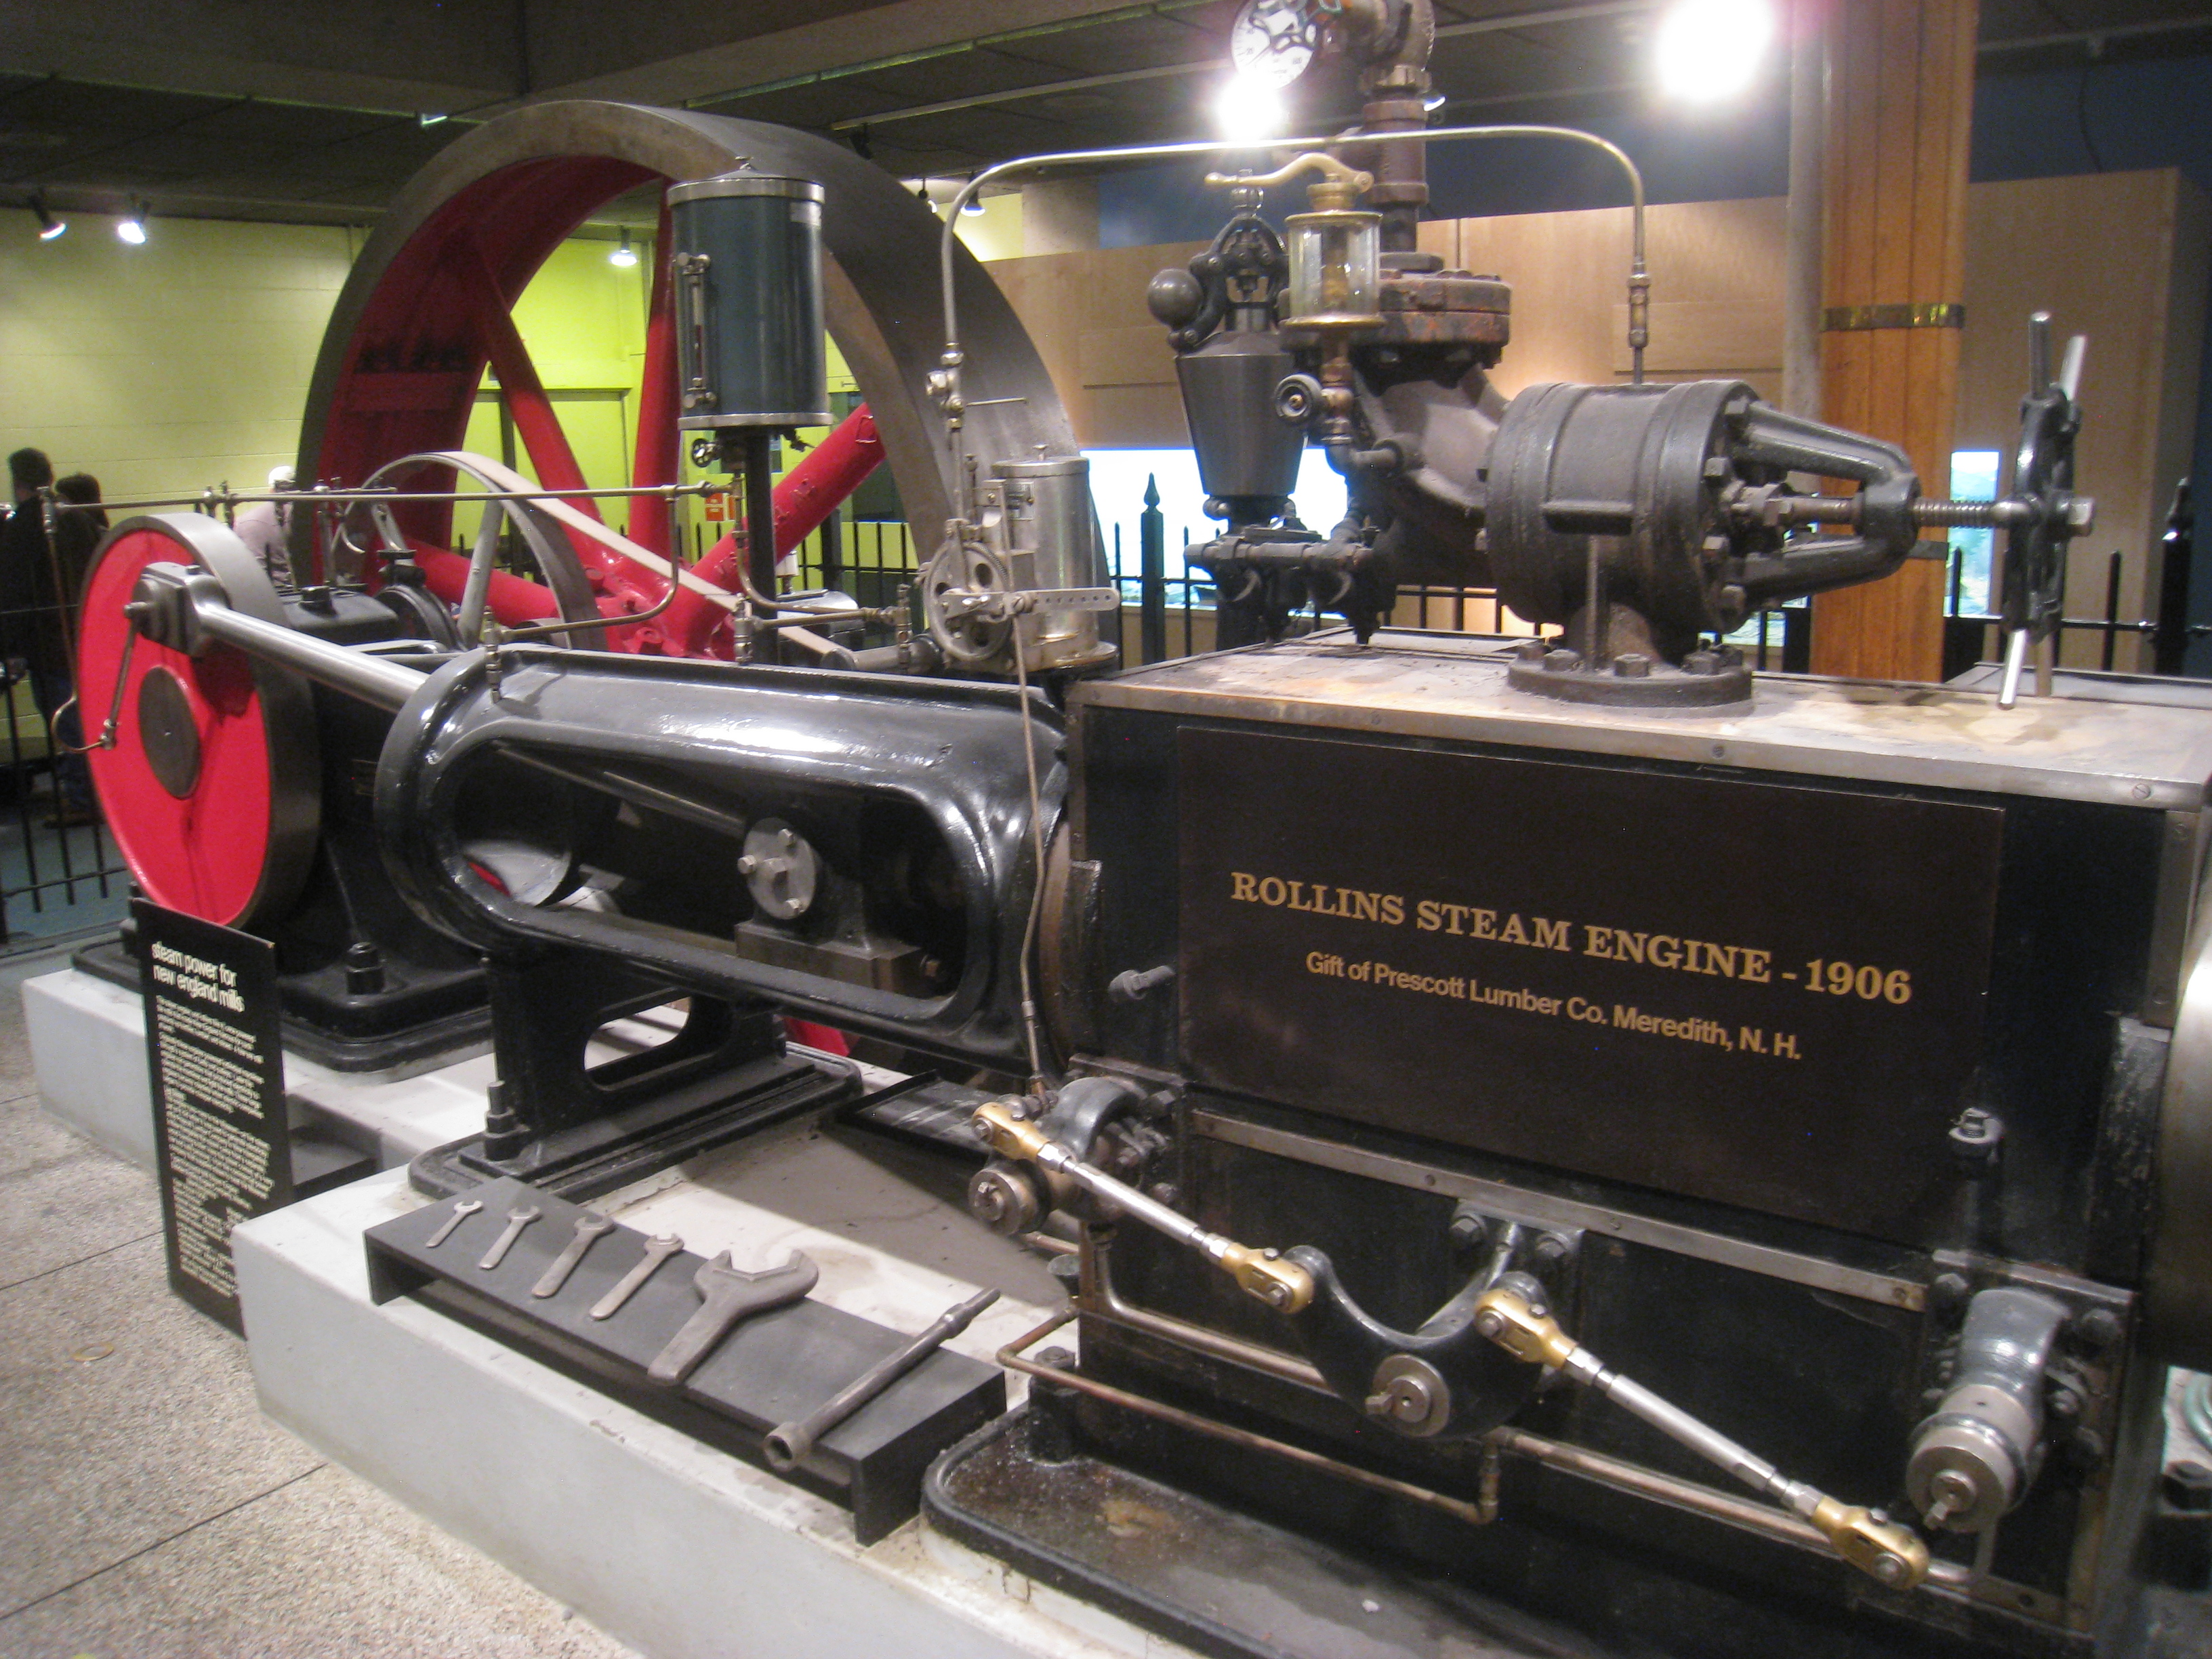 File:Museum of Science, Boston, MA - IMG 3199.JPG